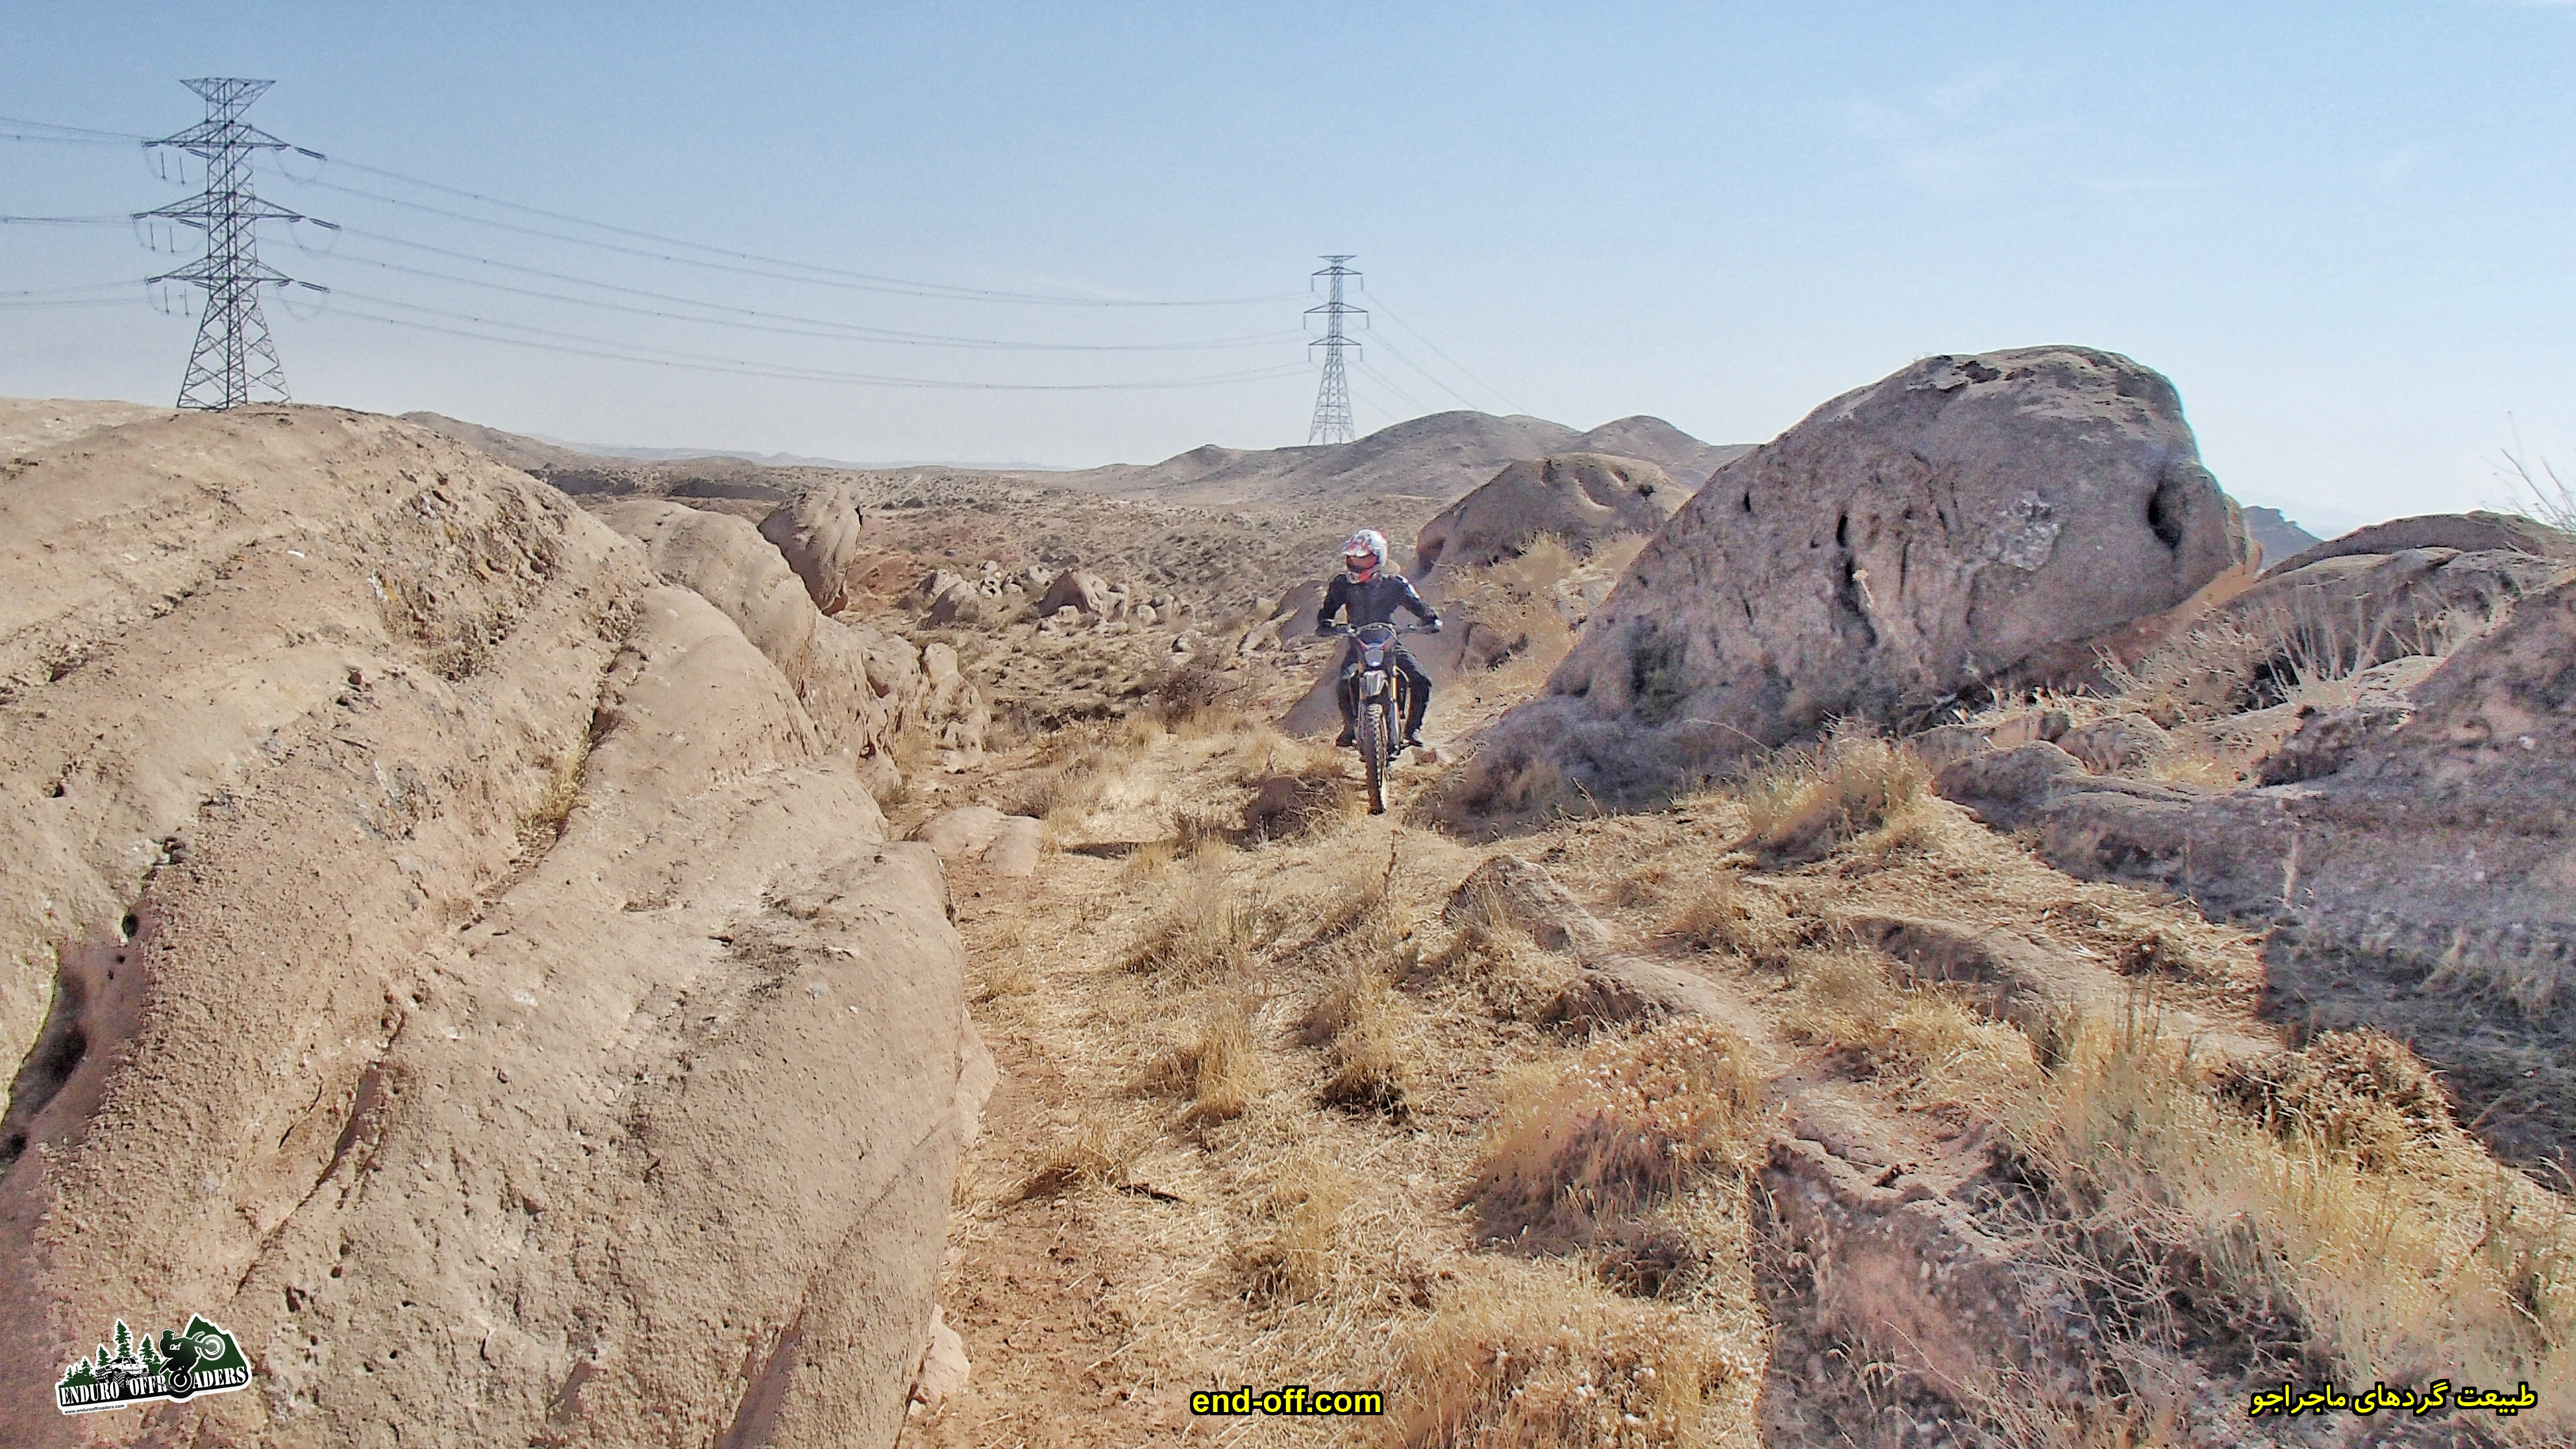 نصرت آباد - جنوب کرج - پاییز 1399 2020